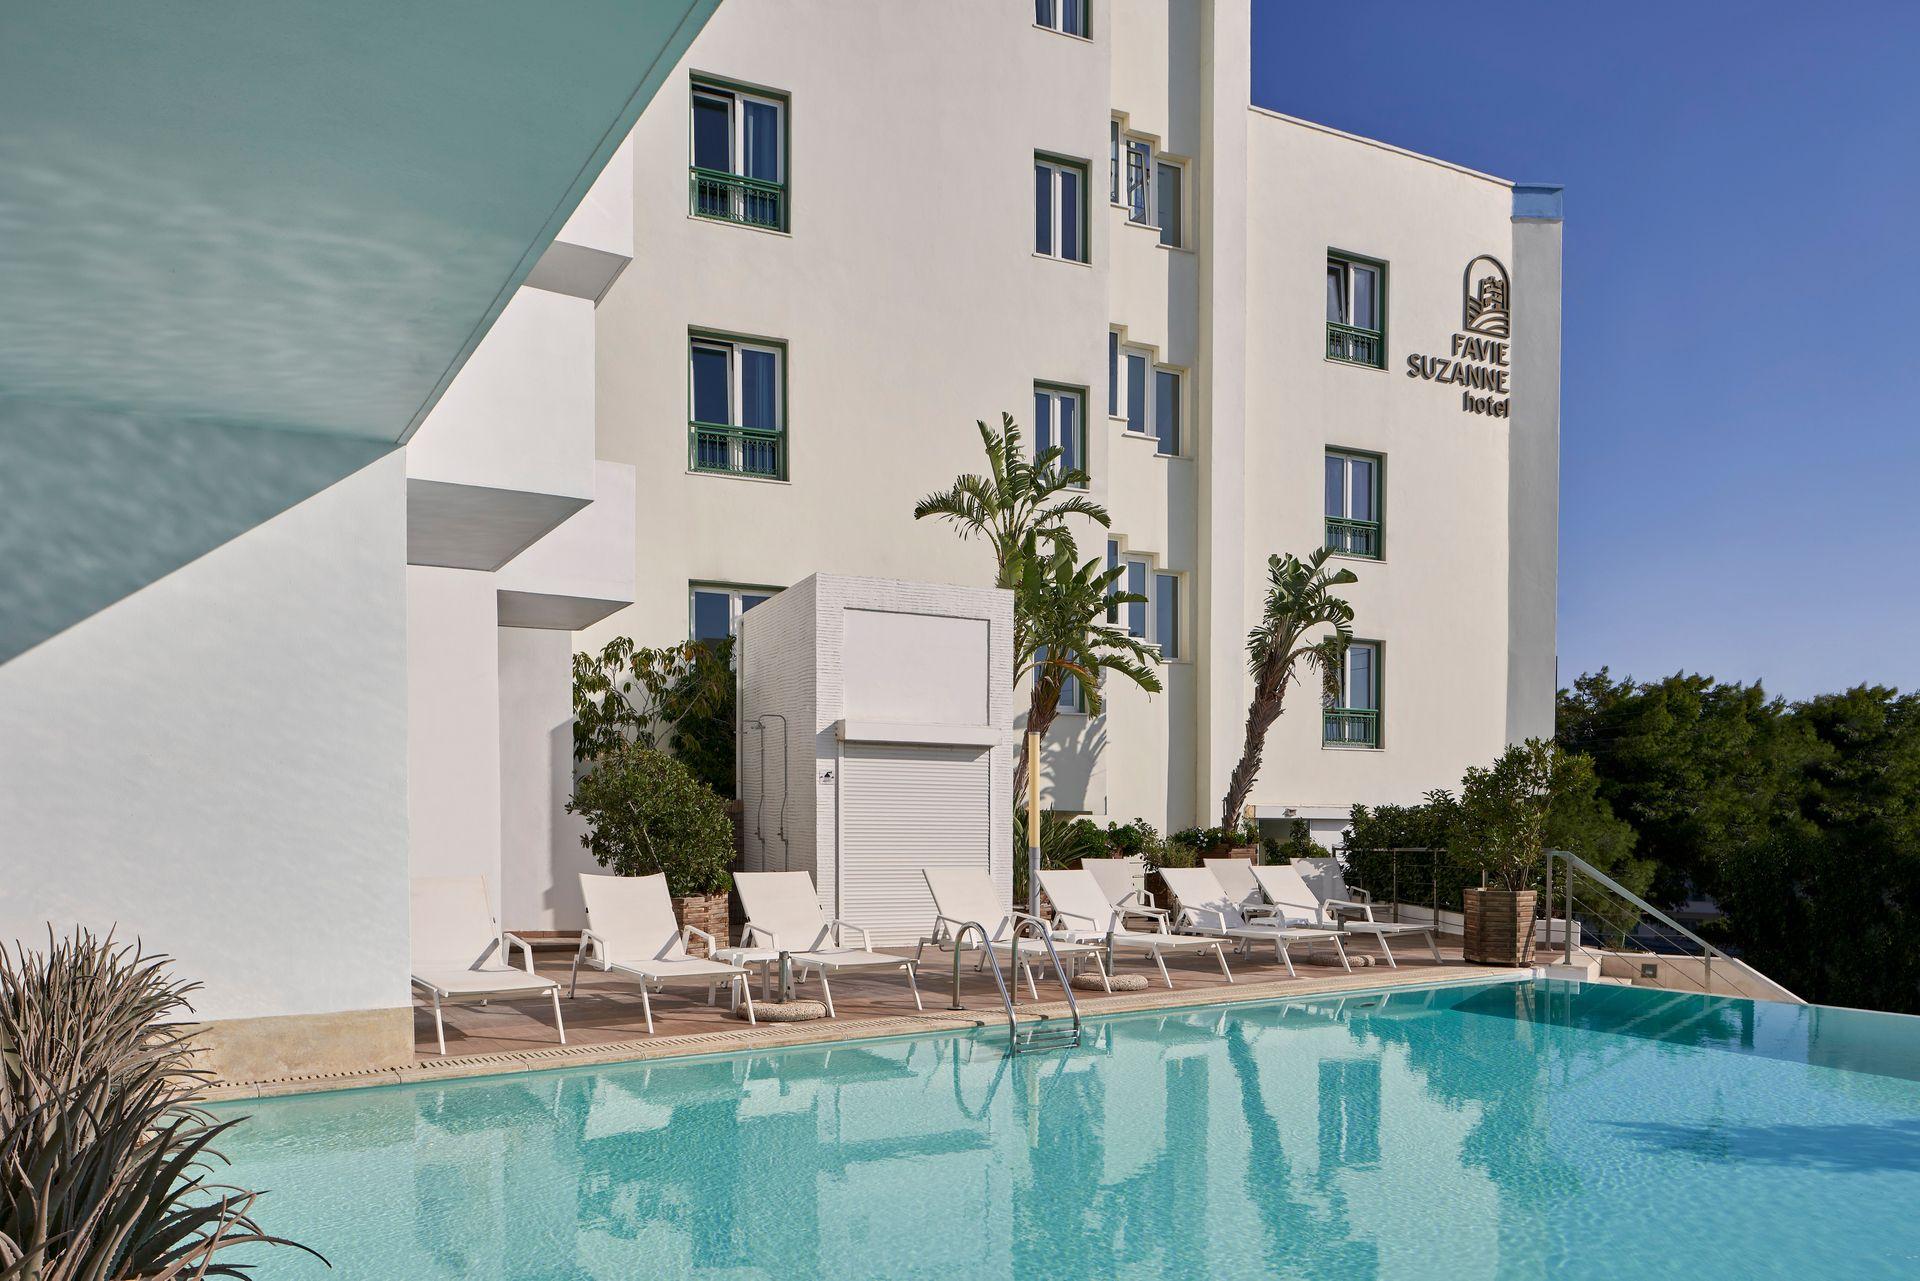 Favie Suzanne Hotel Tinos - Τήνος ✦ -43% ✦ 4 Ημέρες